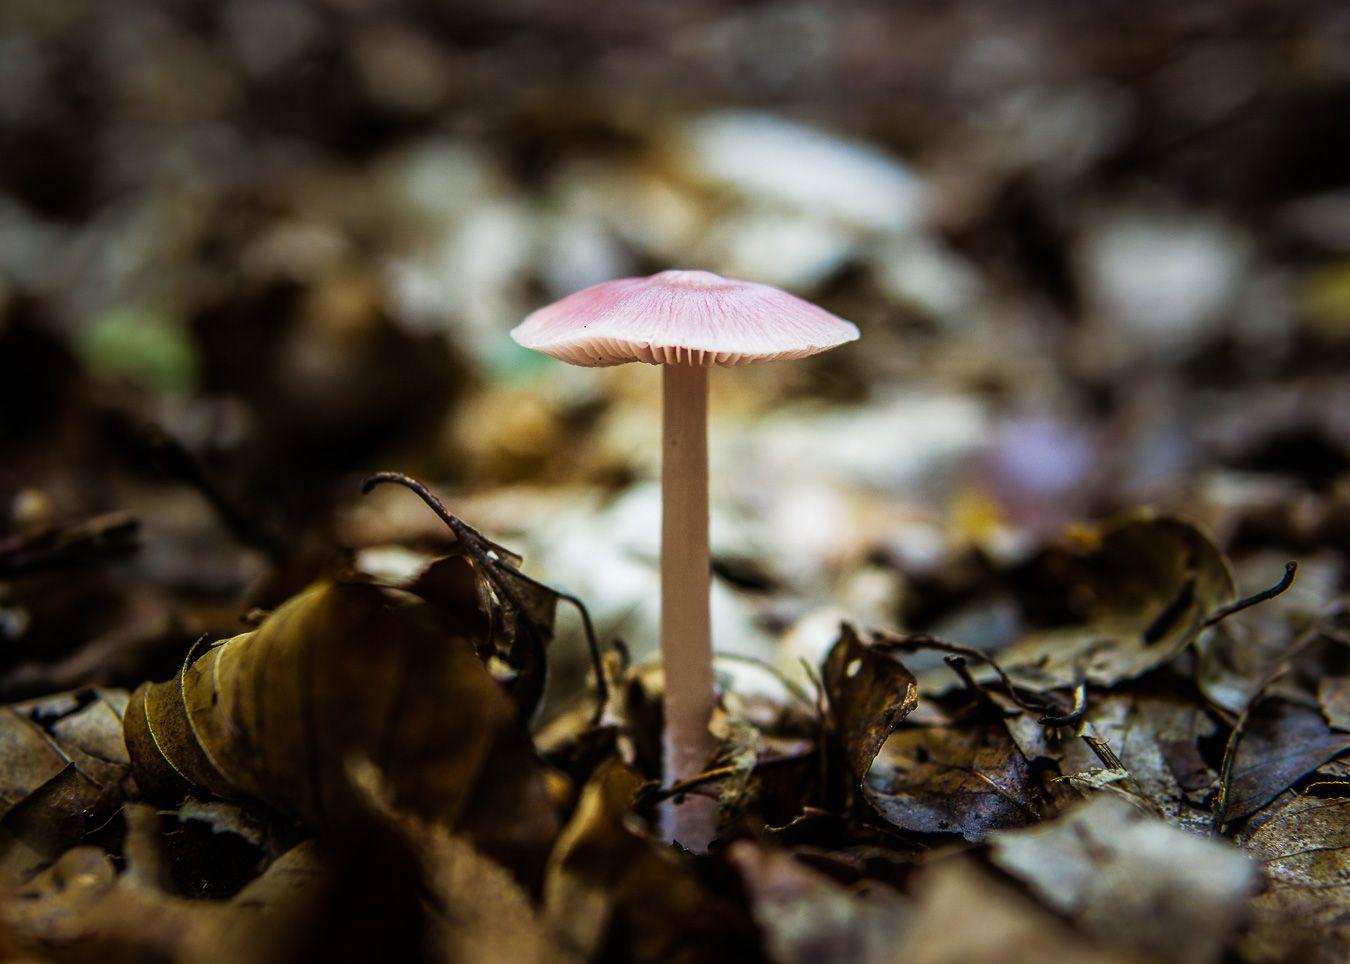 Pilze #pilze #sonya6000 #mushrooms #sigma30mm